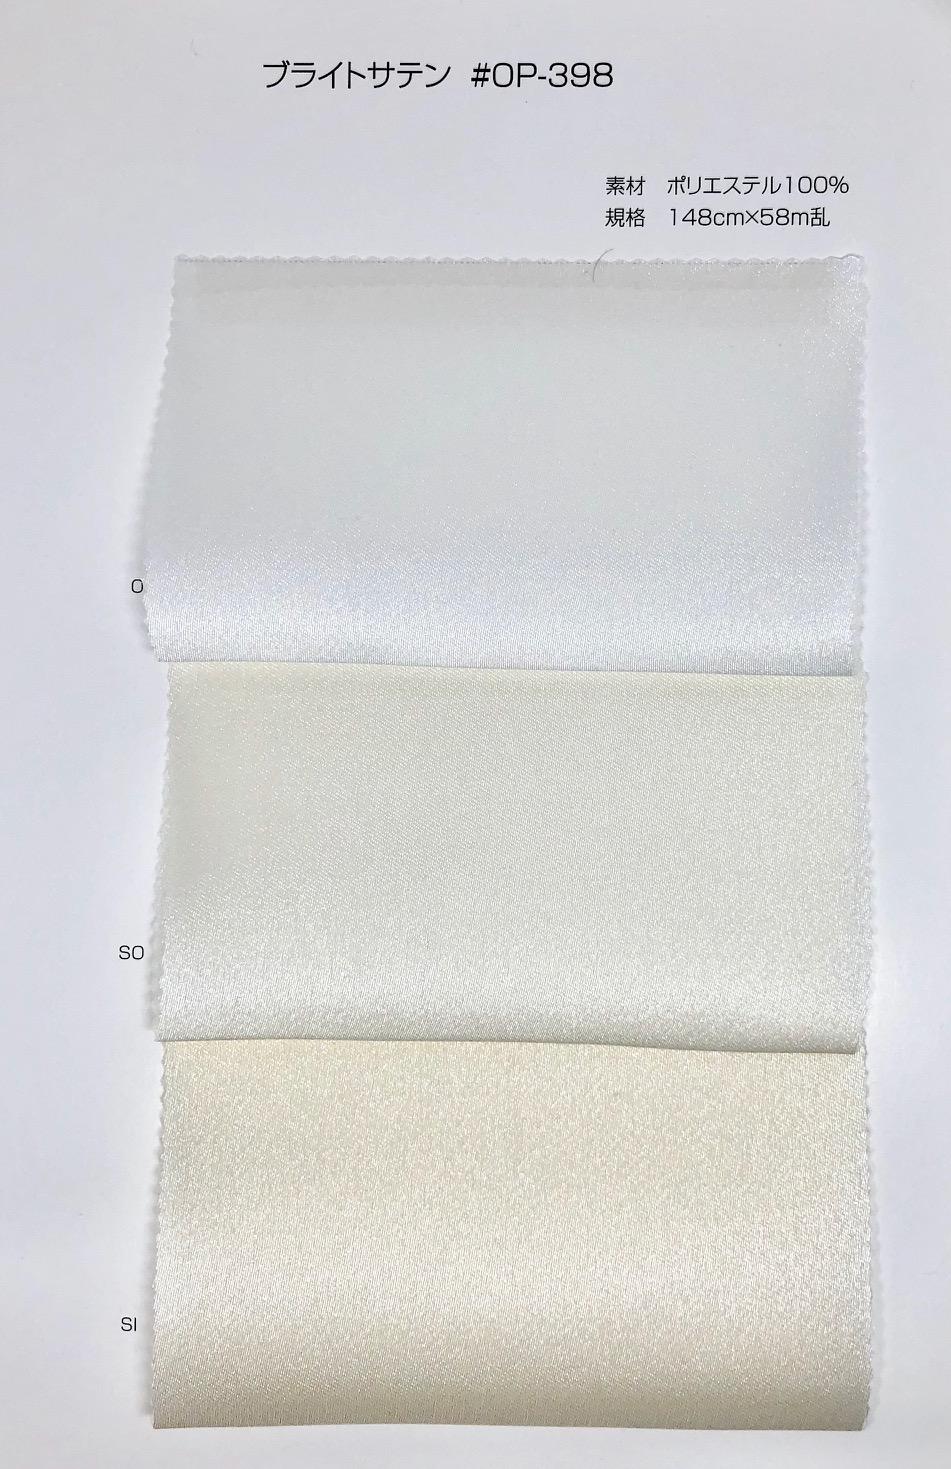 OP-398 ブライトサテン[生地] サンコロナ小田/オークラ商事 - ApparelX アパレル資材卸通販